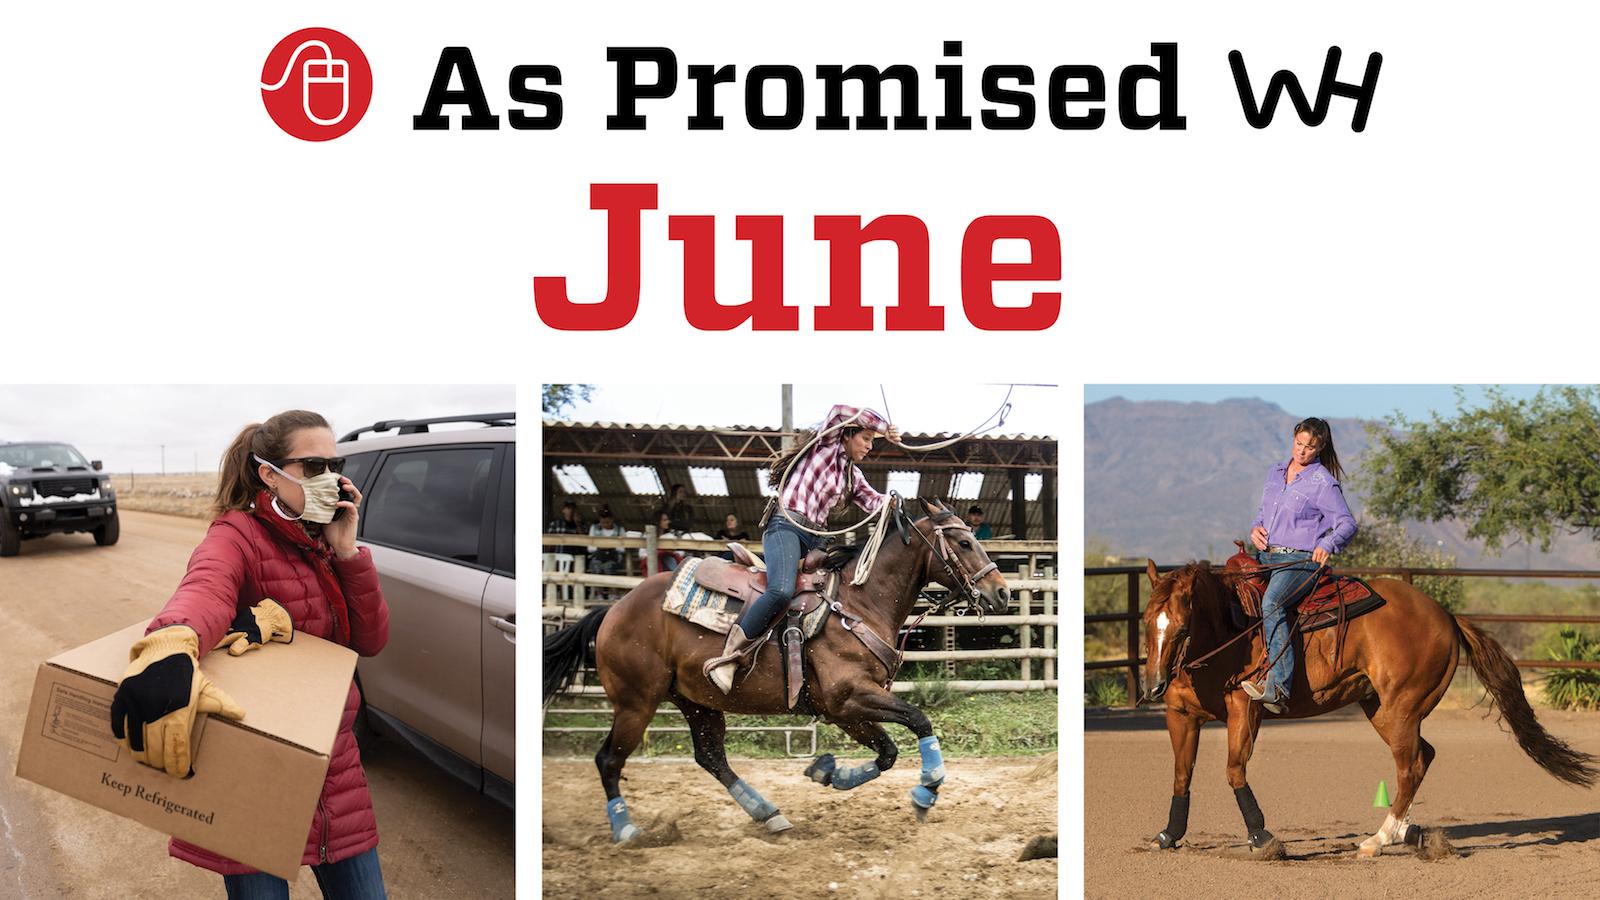 western horseman magazine june 2020 promised content